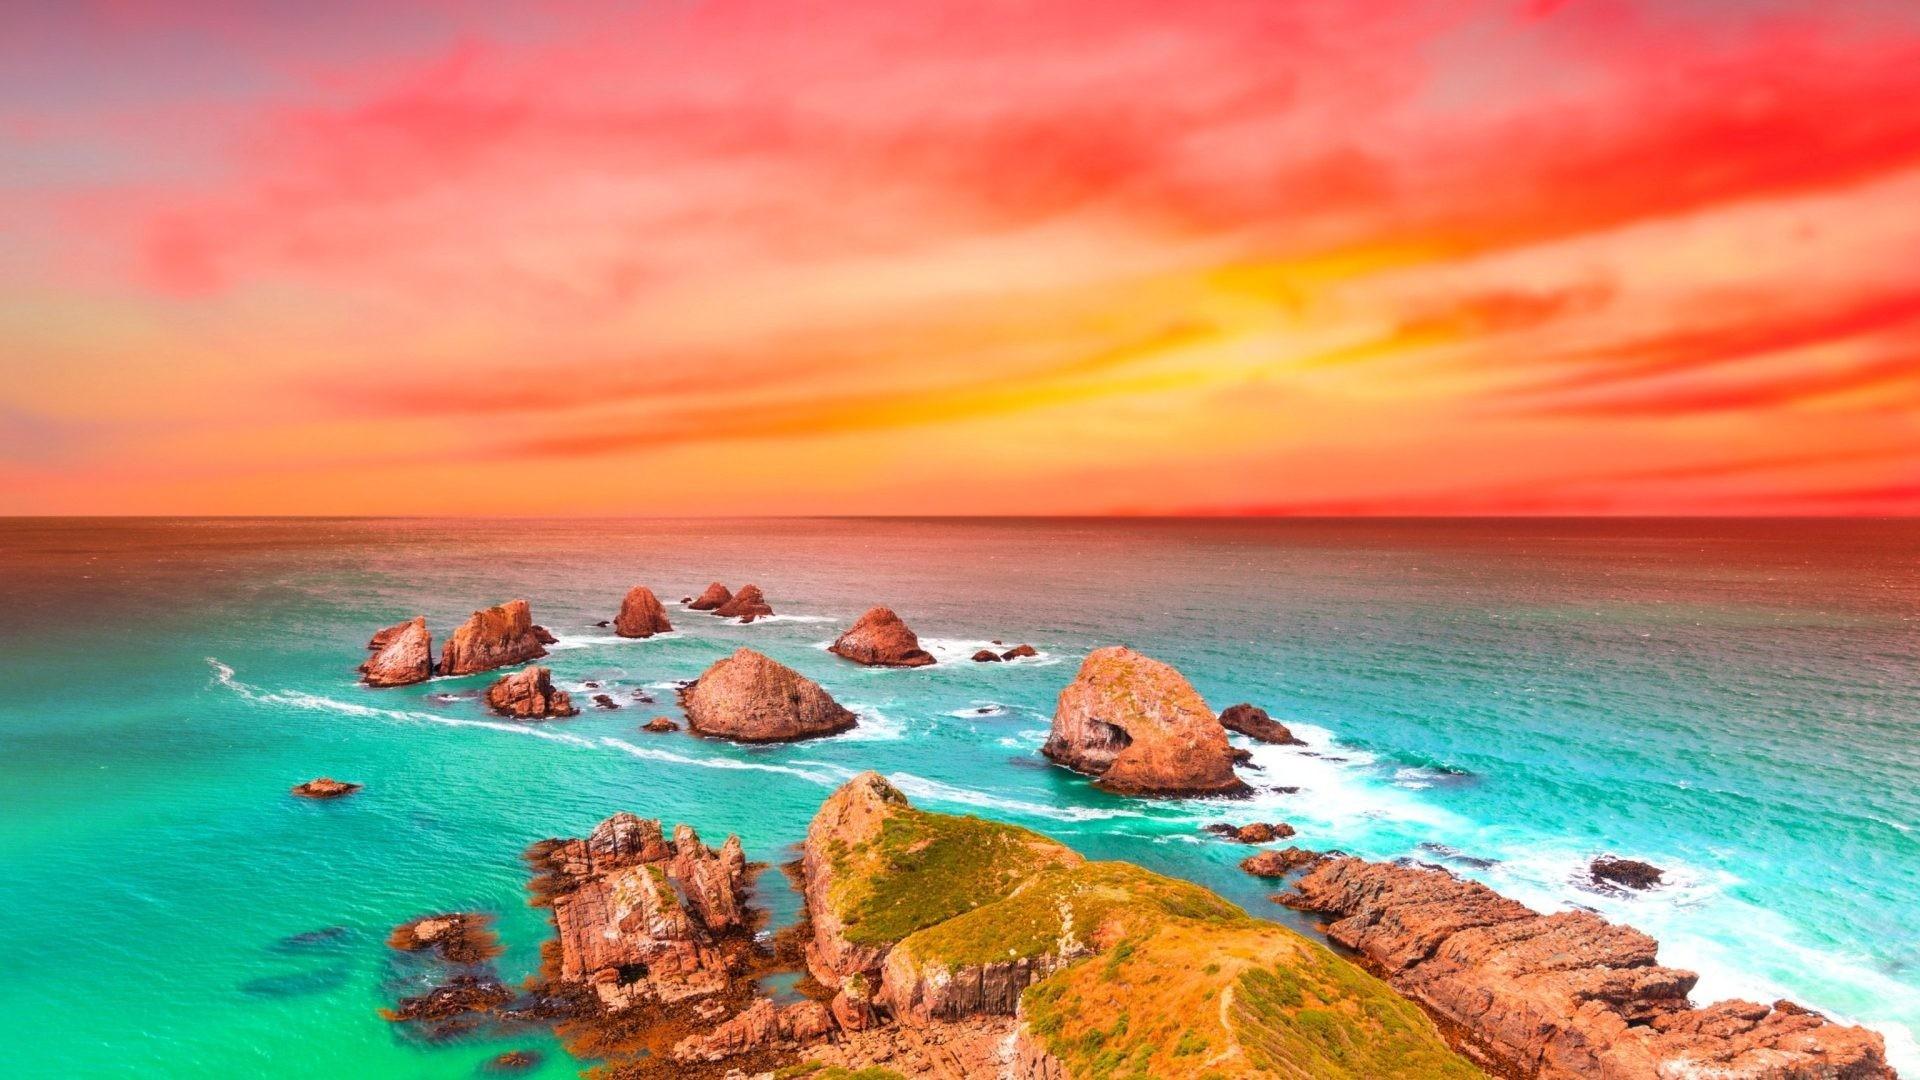 Beautiful Shore Colorful Sunset Sea Rocks Colors Ocean Magnificent Scenery  Wallpaper For Ipad – 1920×1200